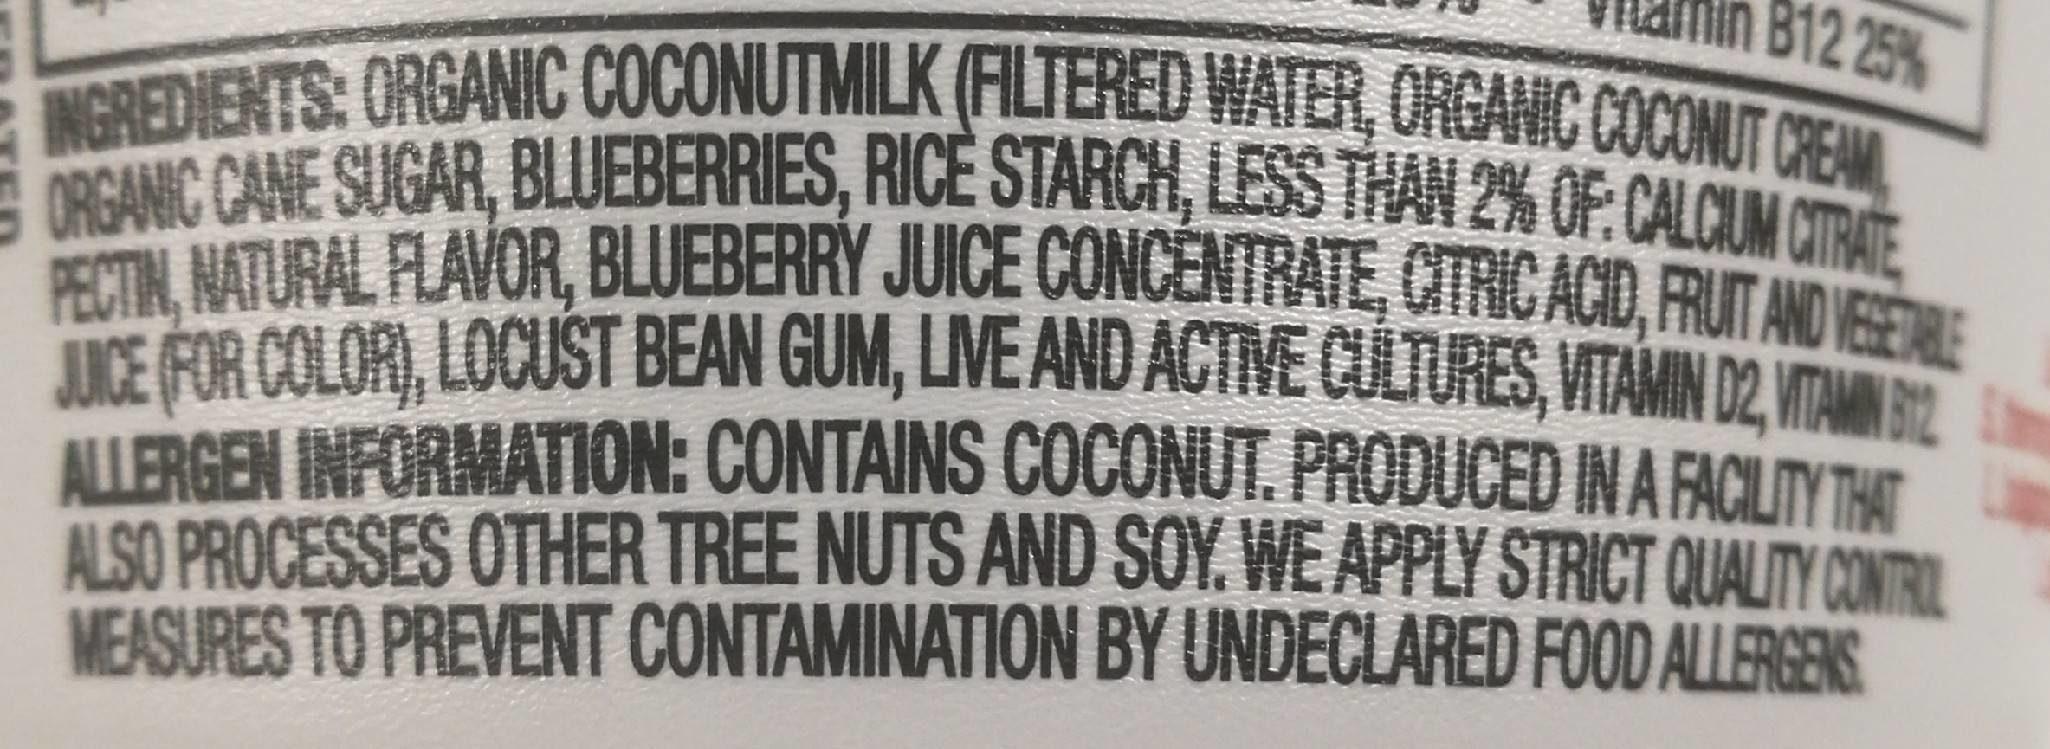 Coconutmilk yogurt alternative - Ingrédients - fr